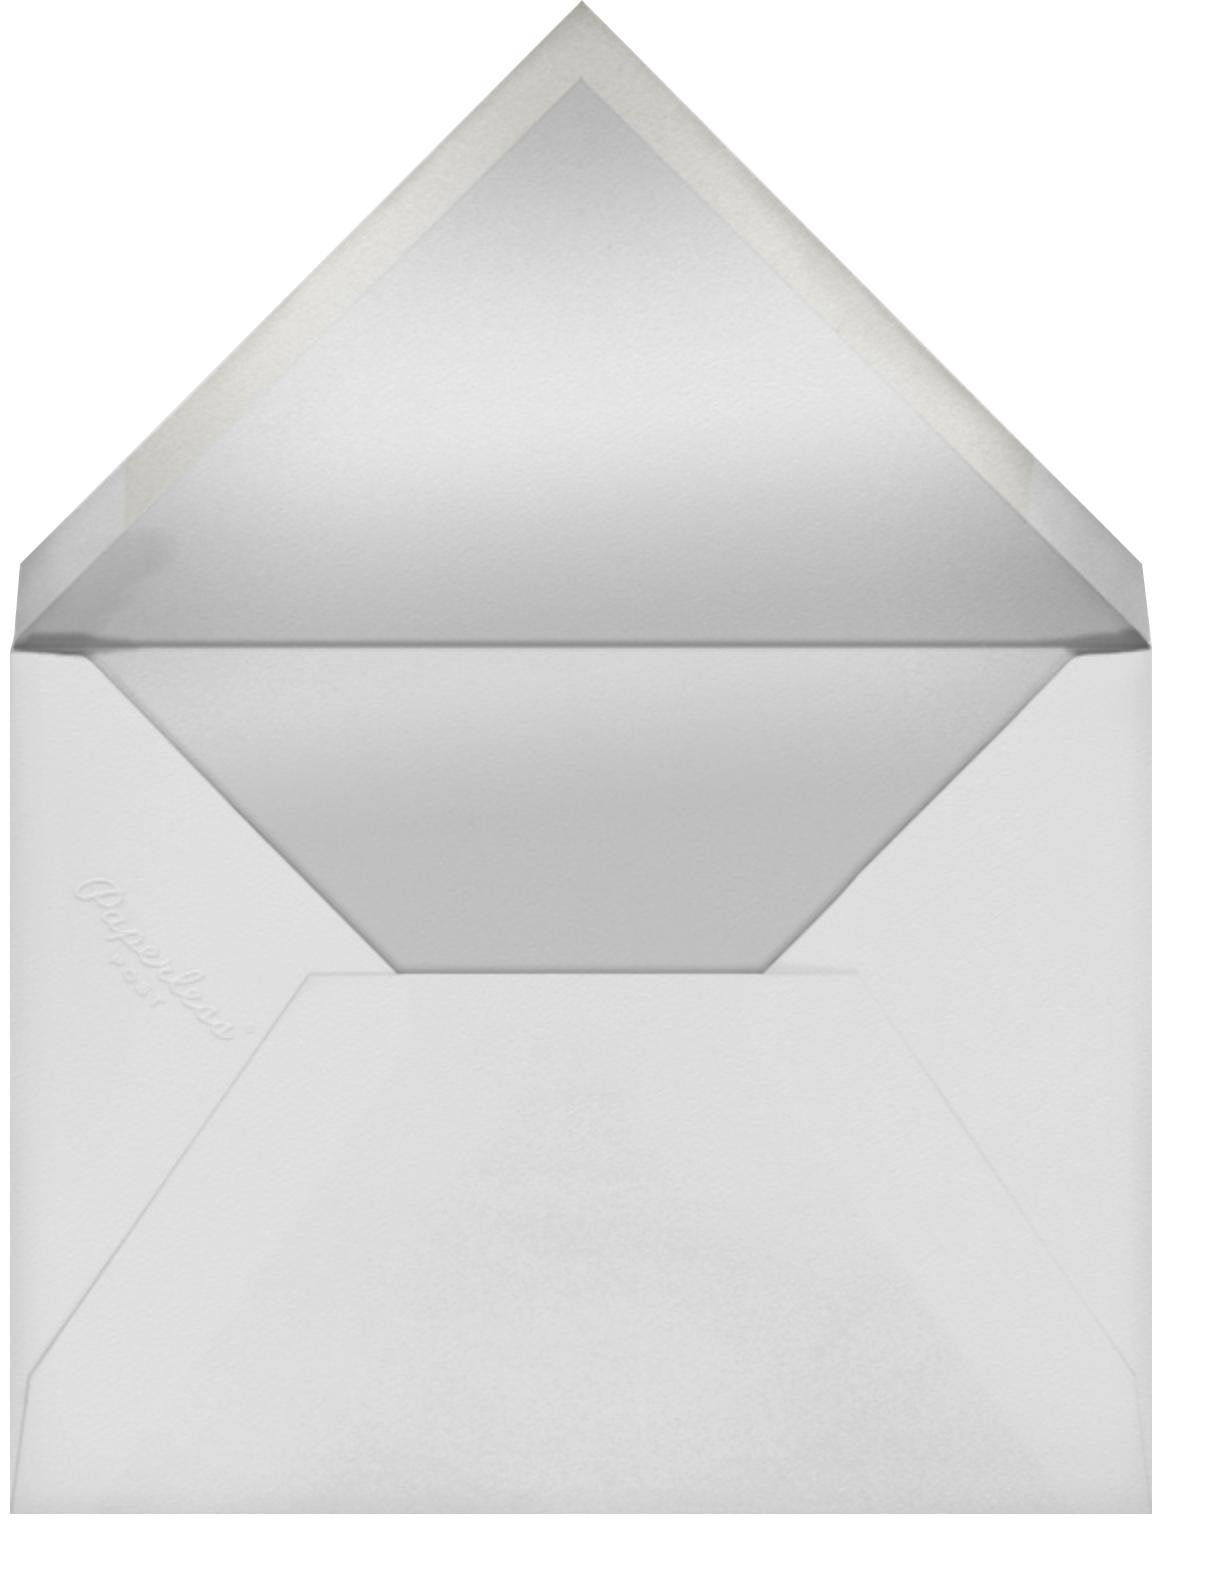 Fall Folk (Program) - Rifle Paper Co. - Menus and programs - envelope back